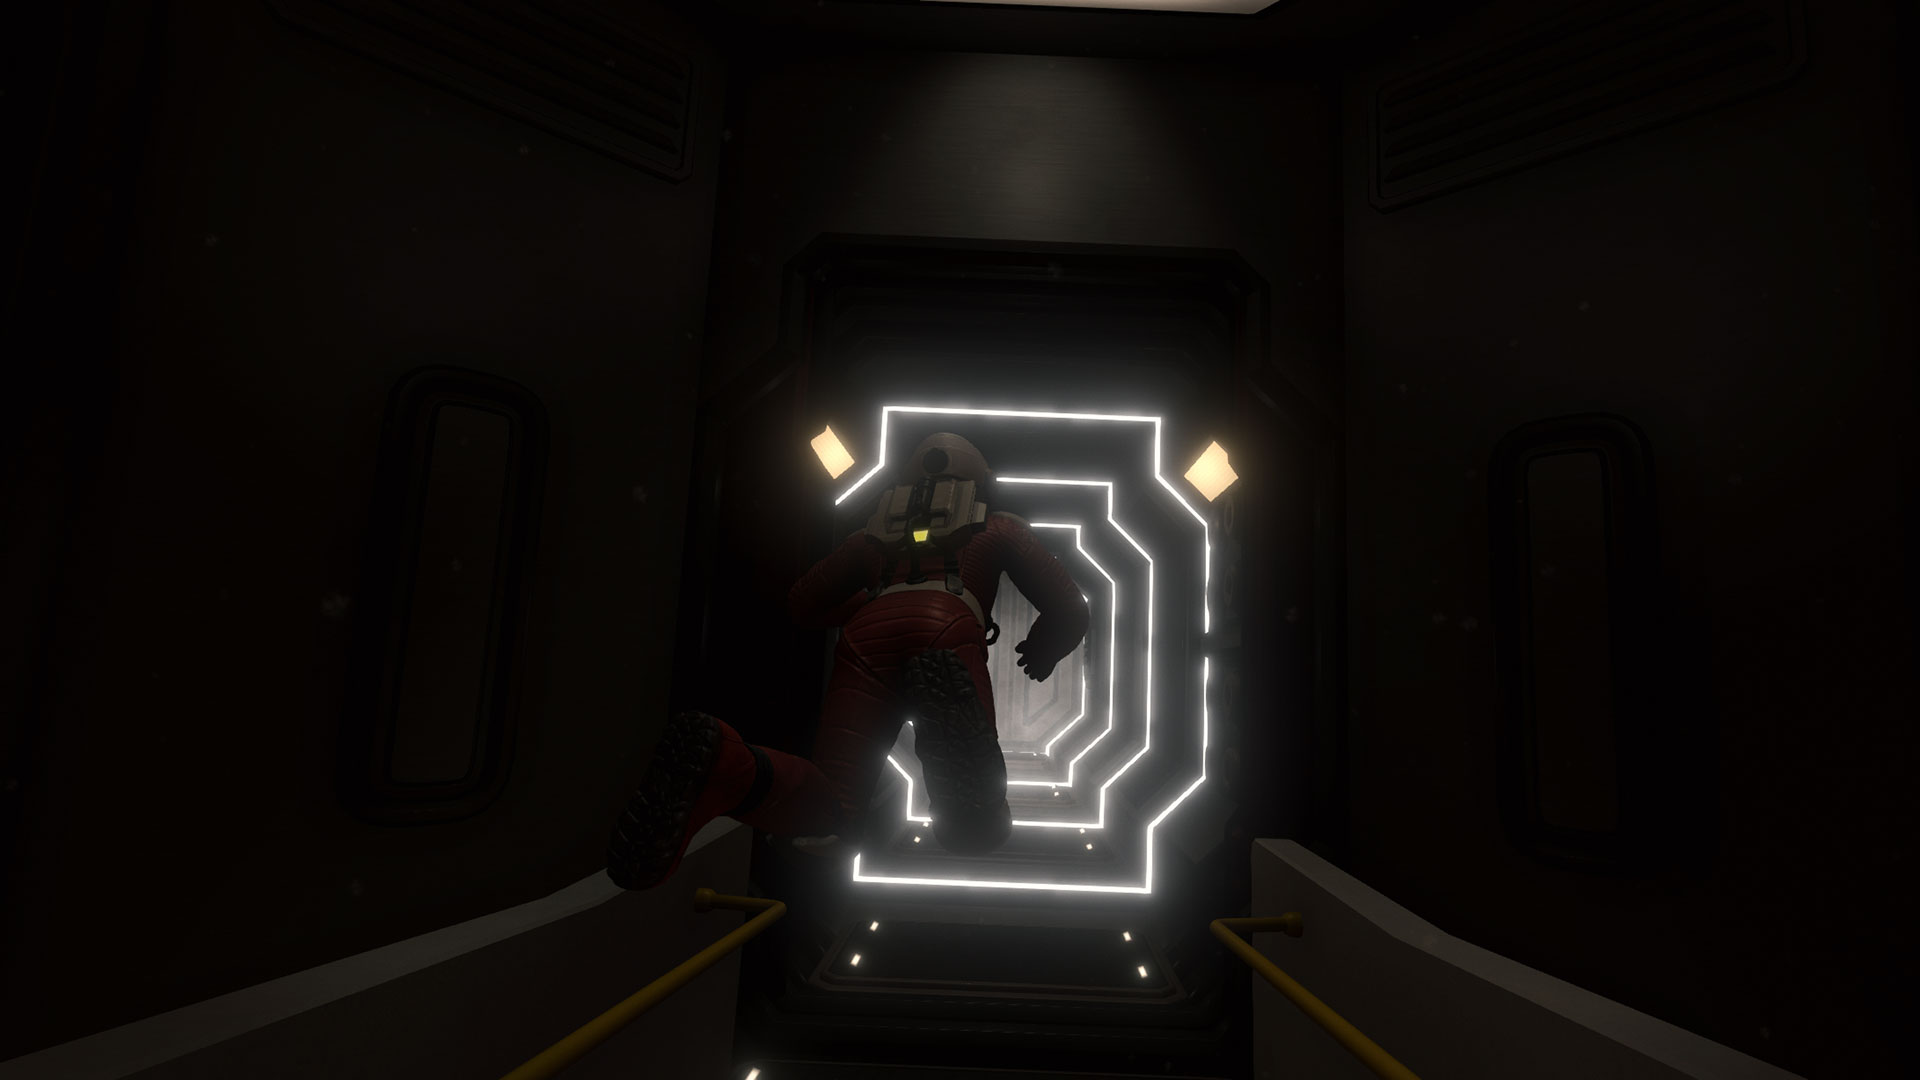 Downward Spiral: Horus Station (PS4) - wordless storytelling